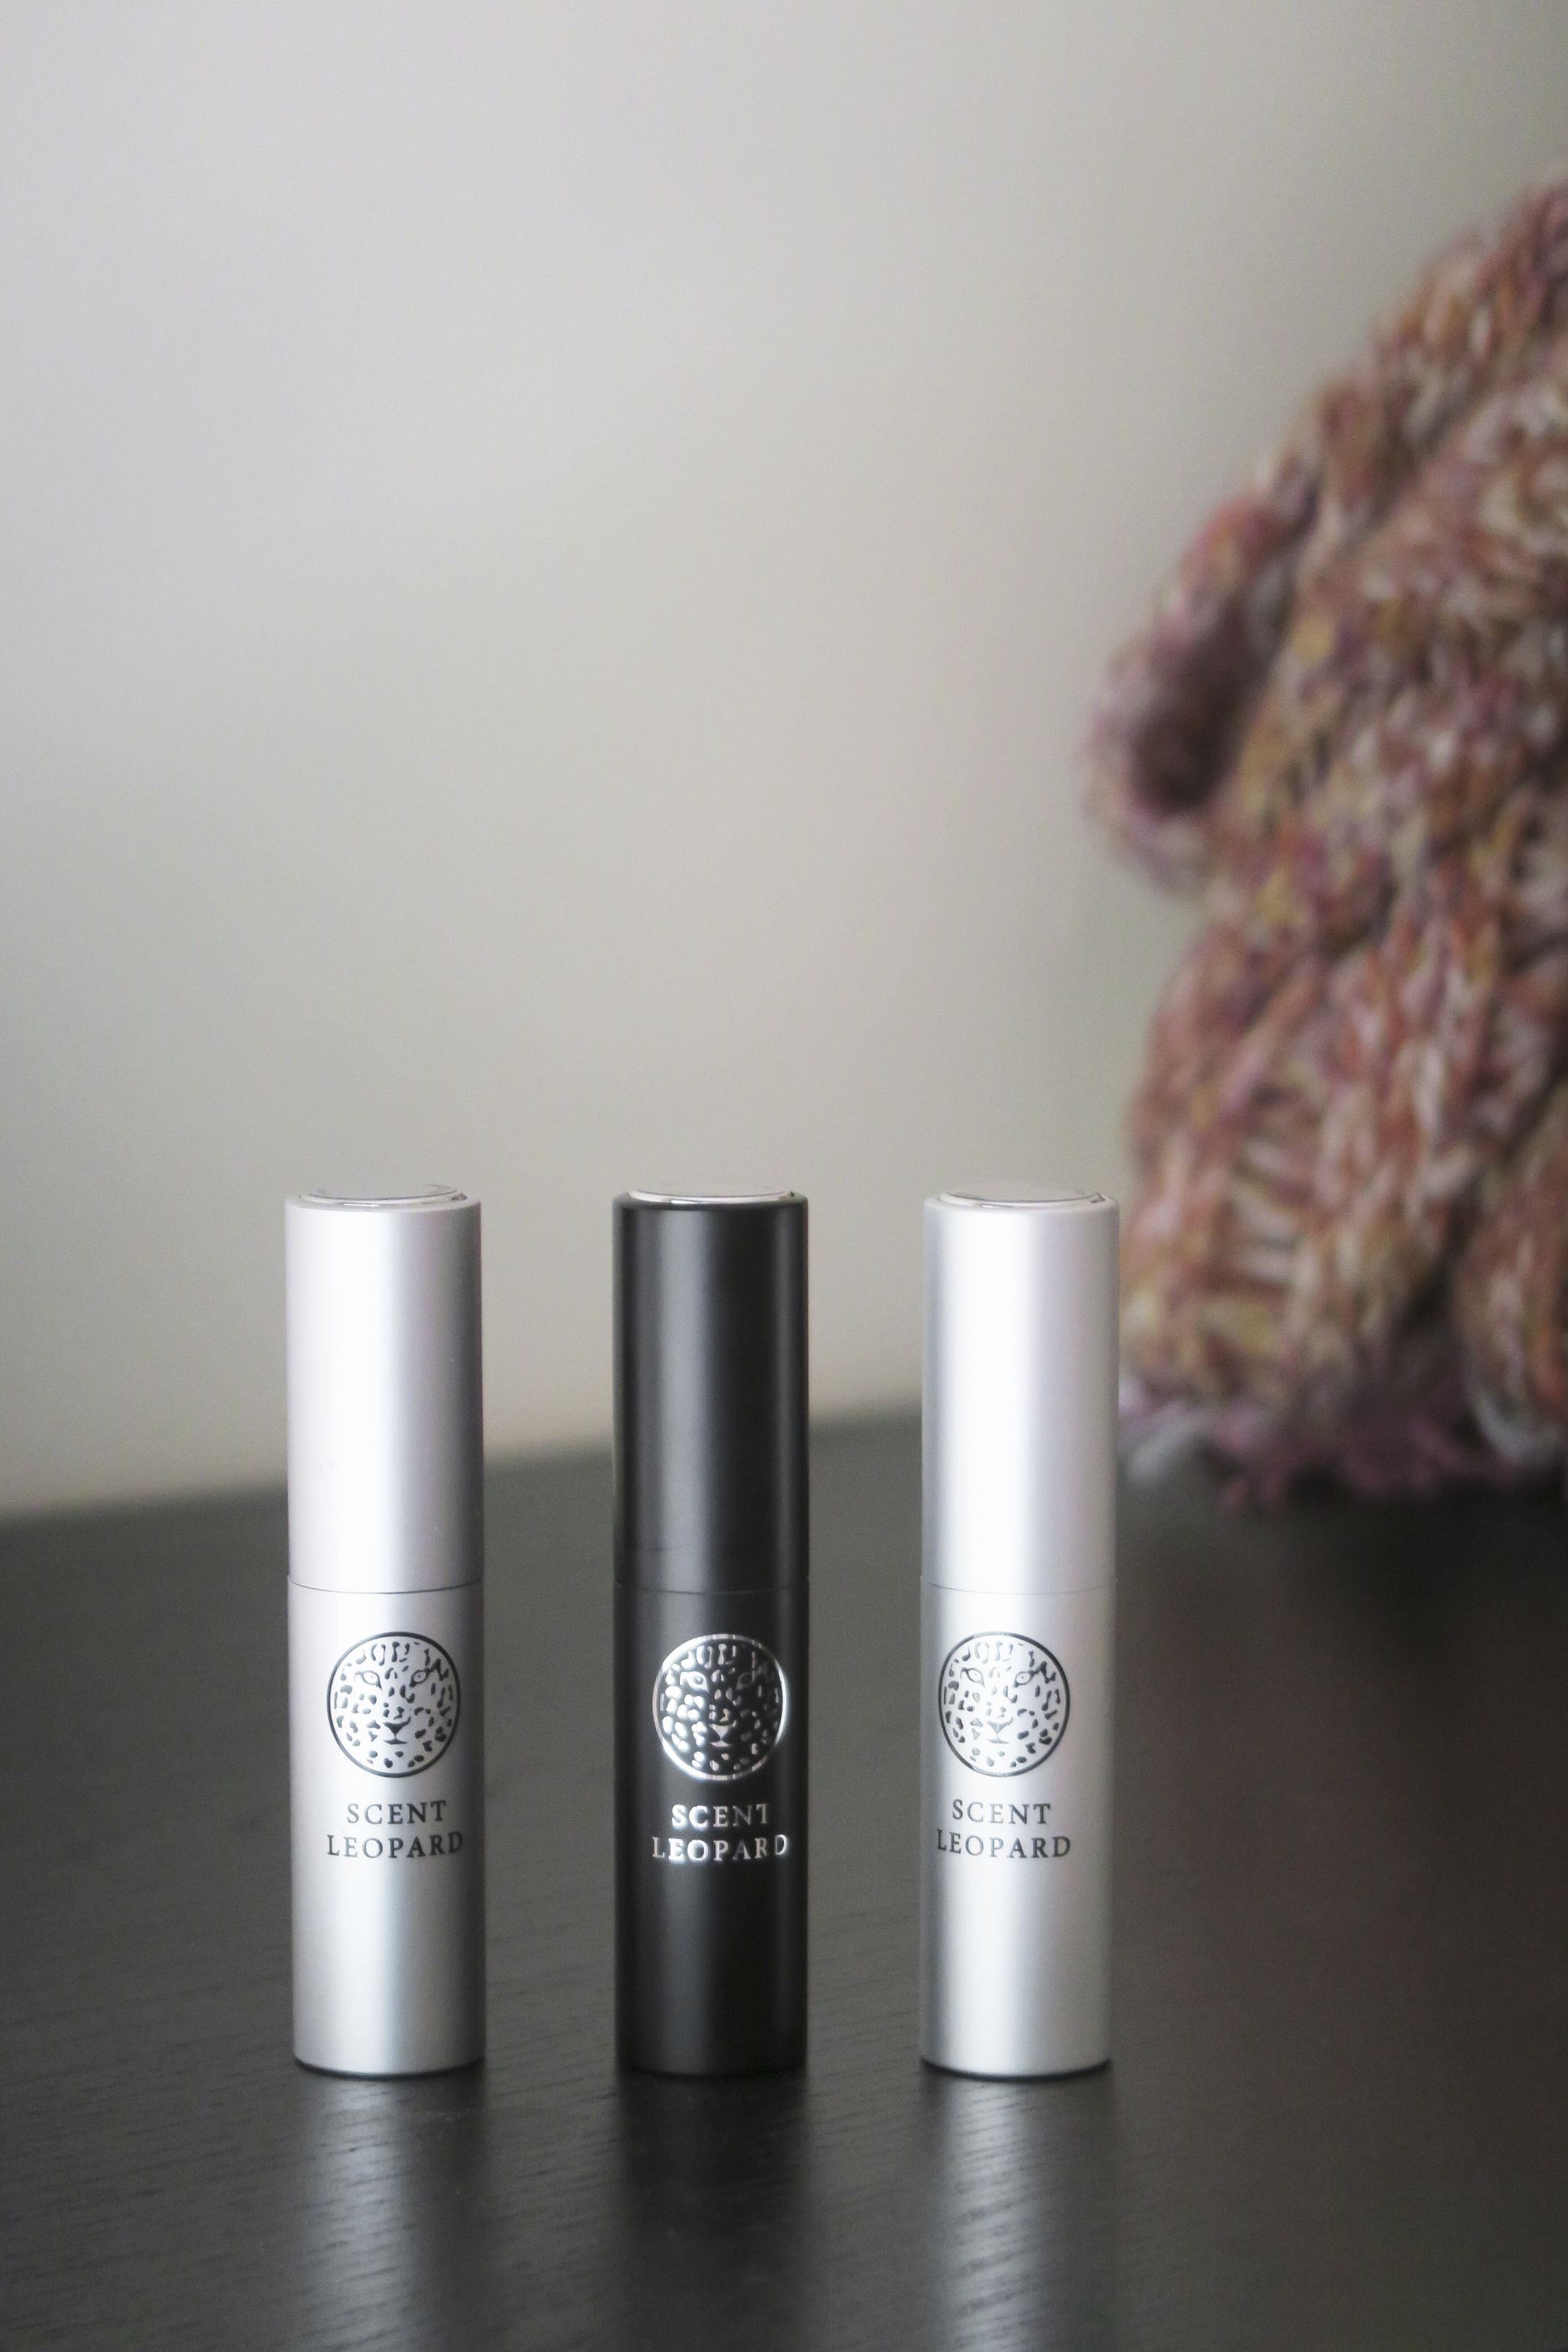 Scent Leopard. Mini Perfumes originales